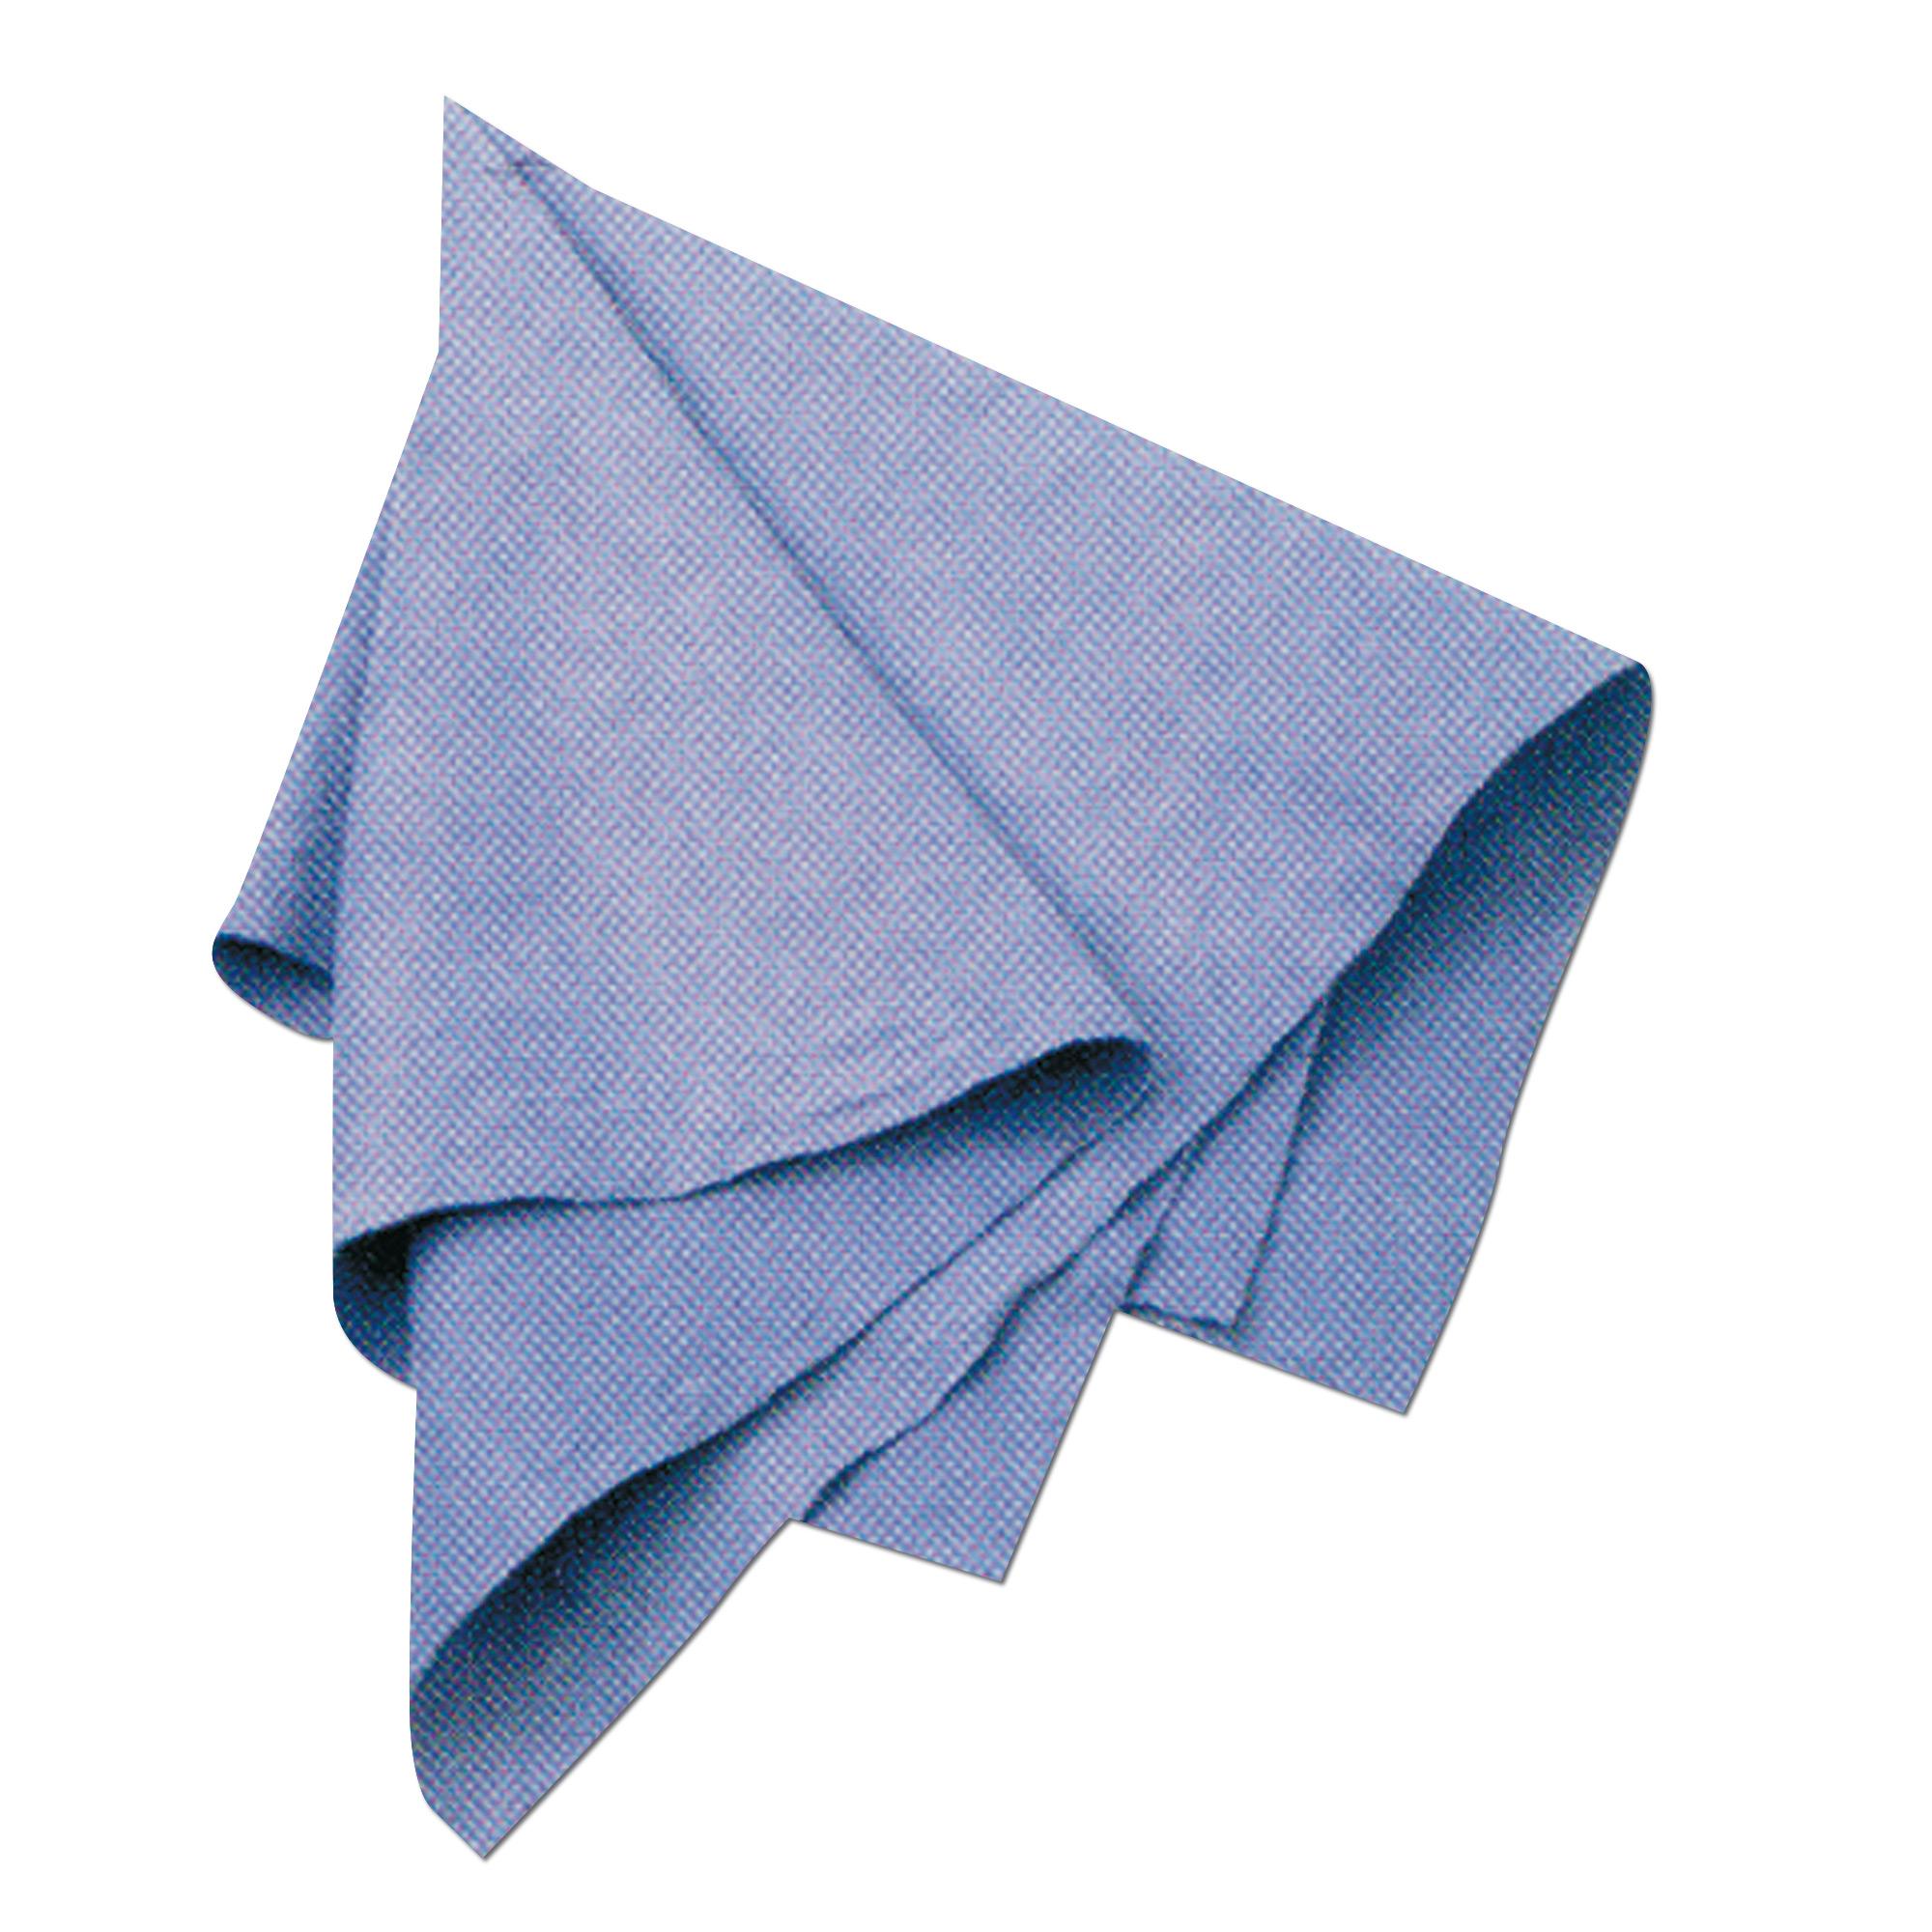 Handtuch Viskosefleece blau